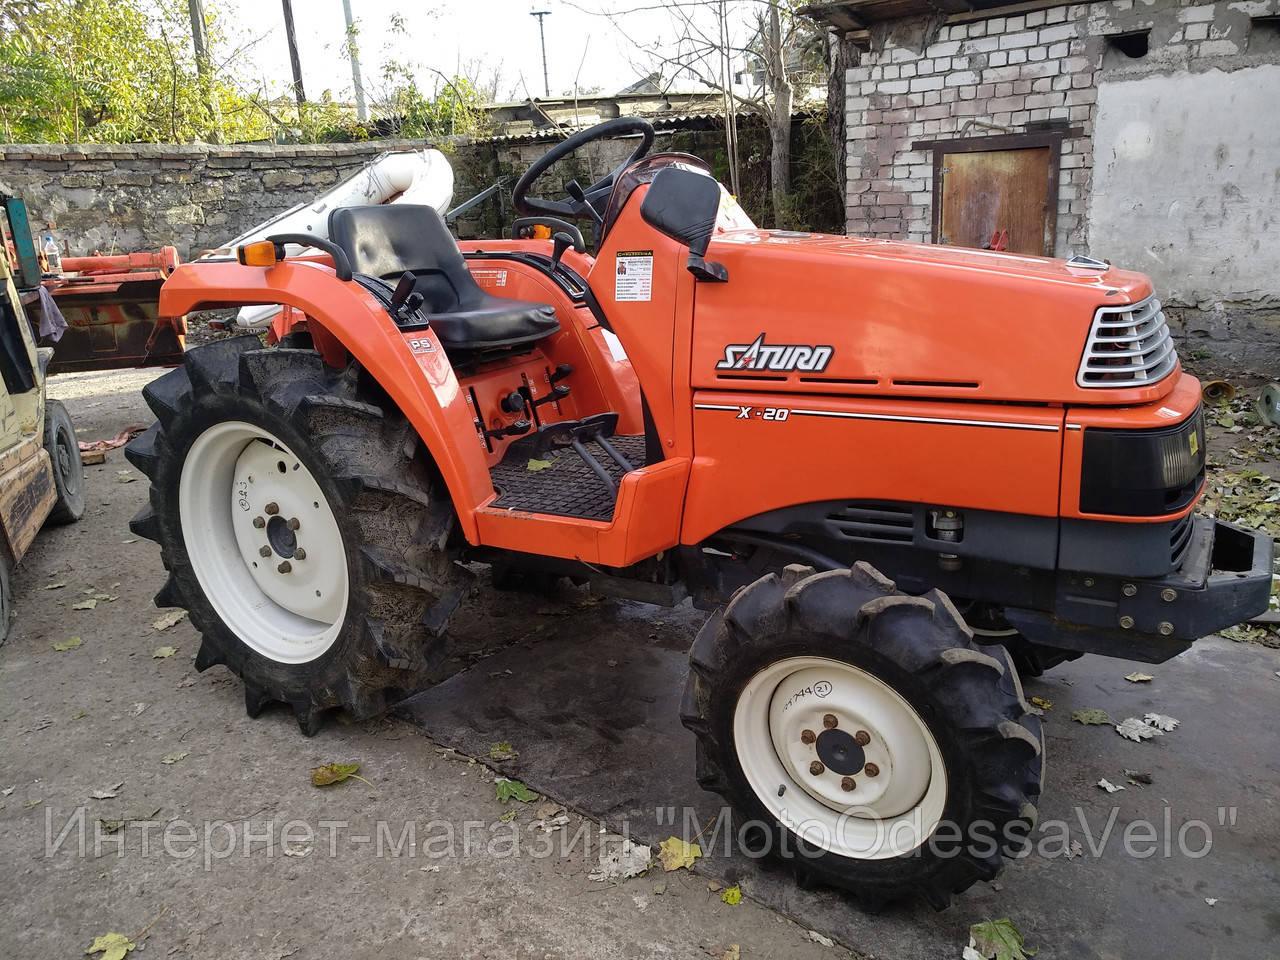 Мини трактор Kubota Saturn x20 4wd